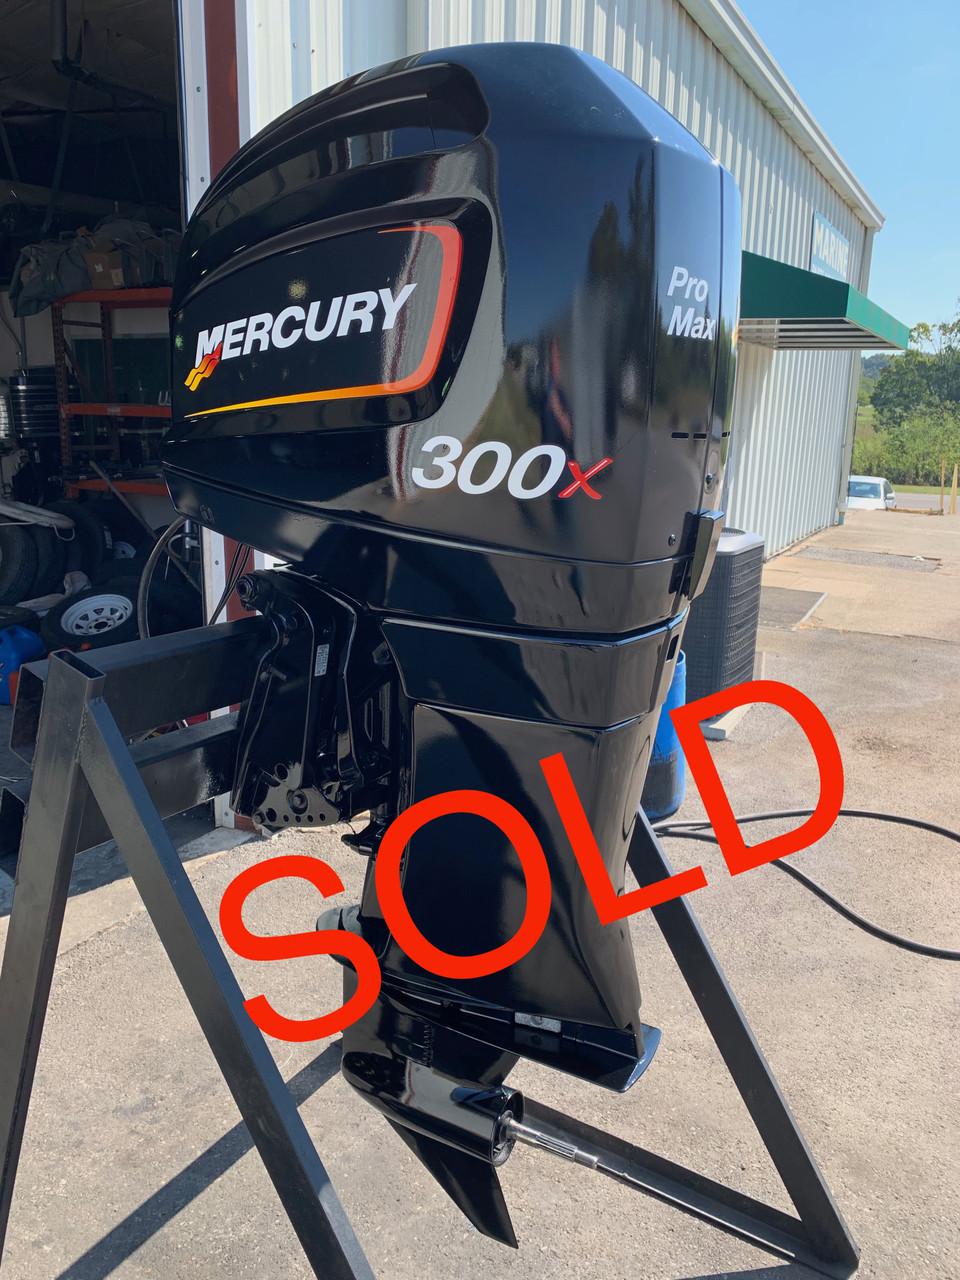 "2001 Mercury Pro Max Racing 300x HP V6 EFI 2 Stroke 25"" (X) Outboard Motor"